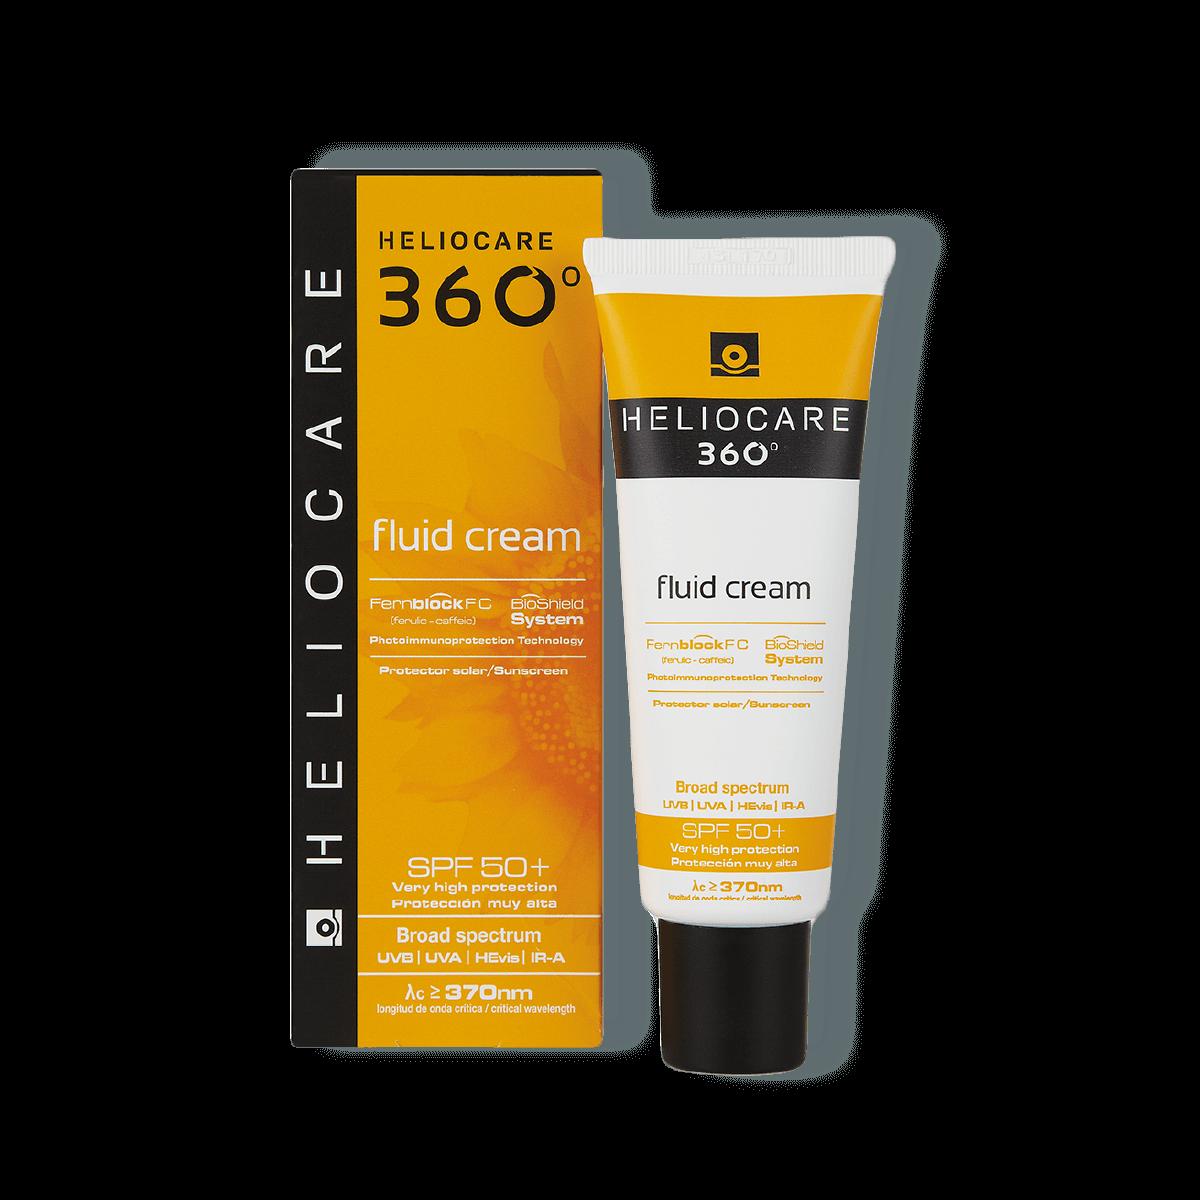 Heliocare 360 Fluid Cream SPF 50+ 50ml